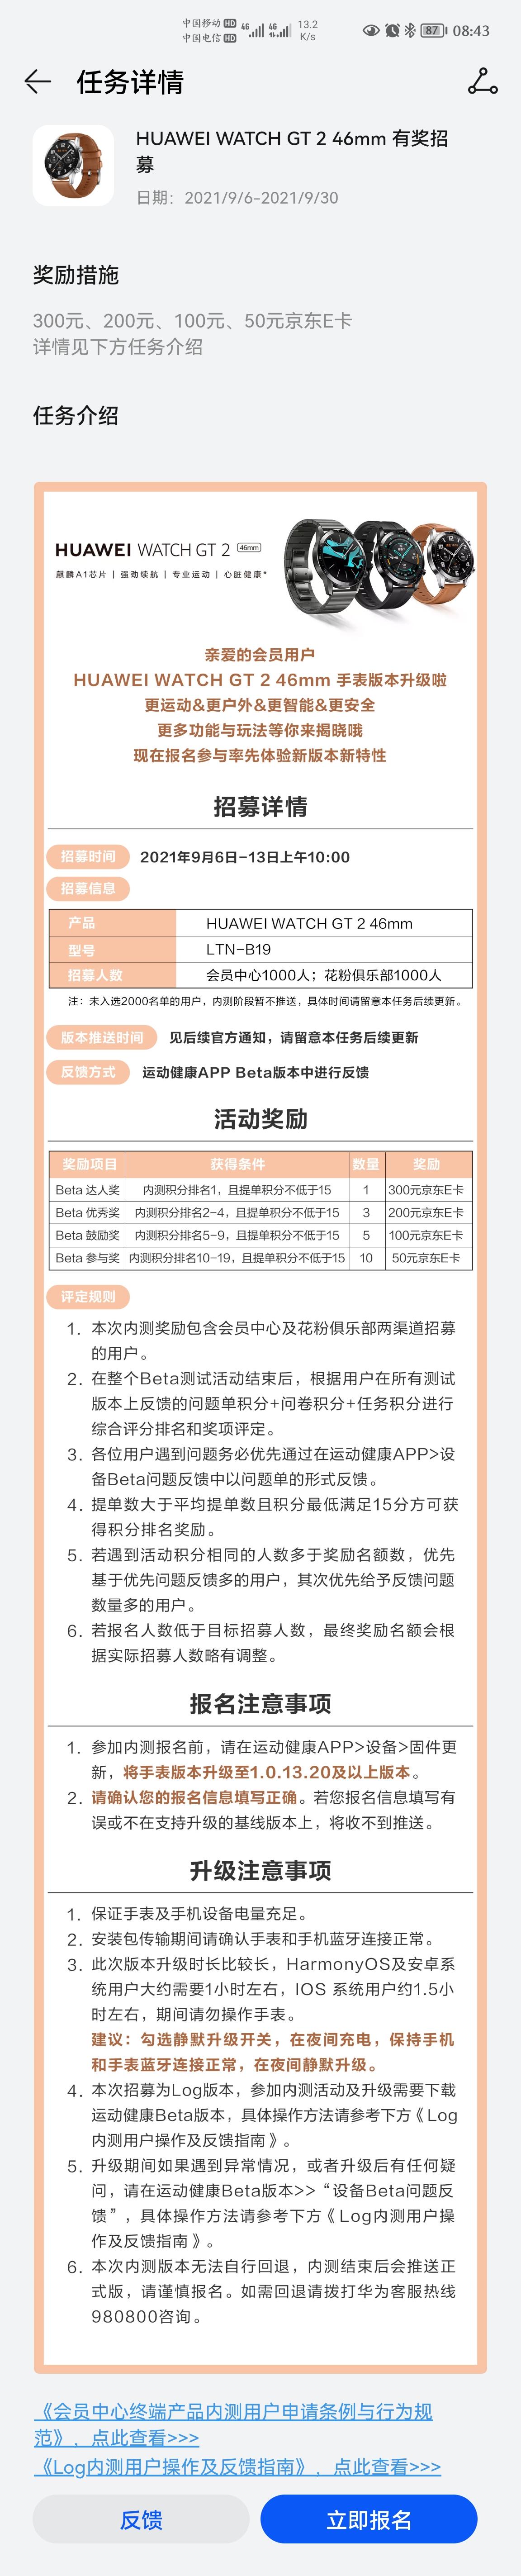 Screenshot_20210908_084259_com.huawei.mycenter.jpg